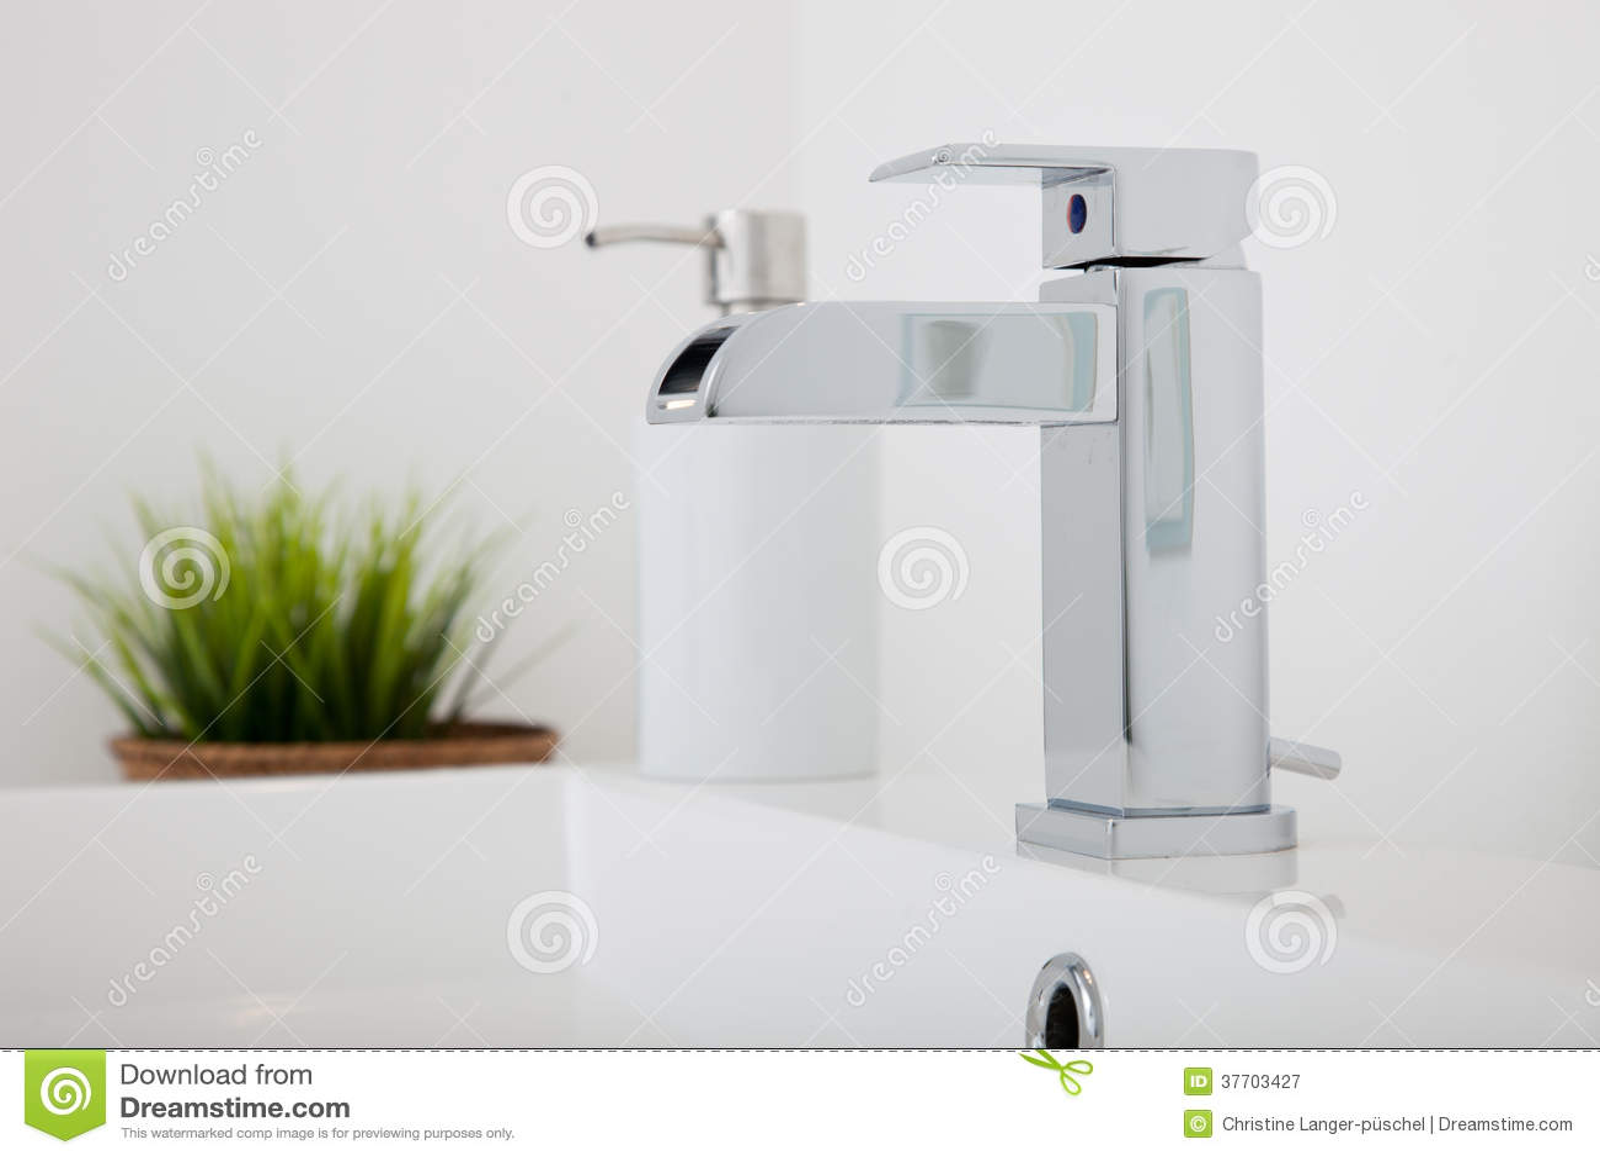 Modern chrome metal tap fitting in a bathroom